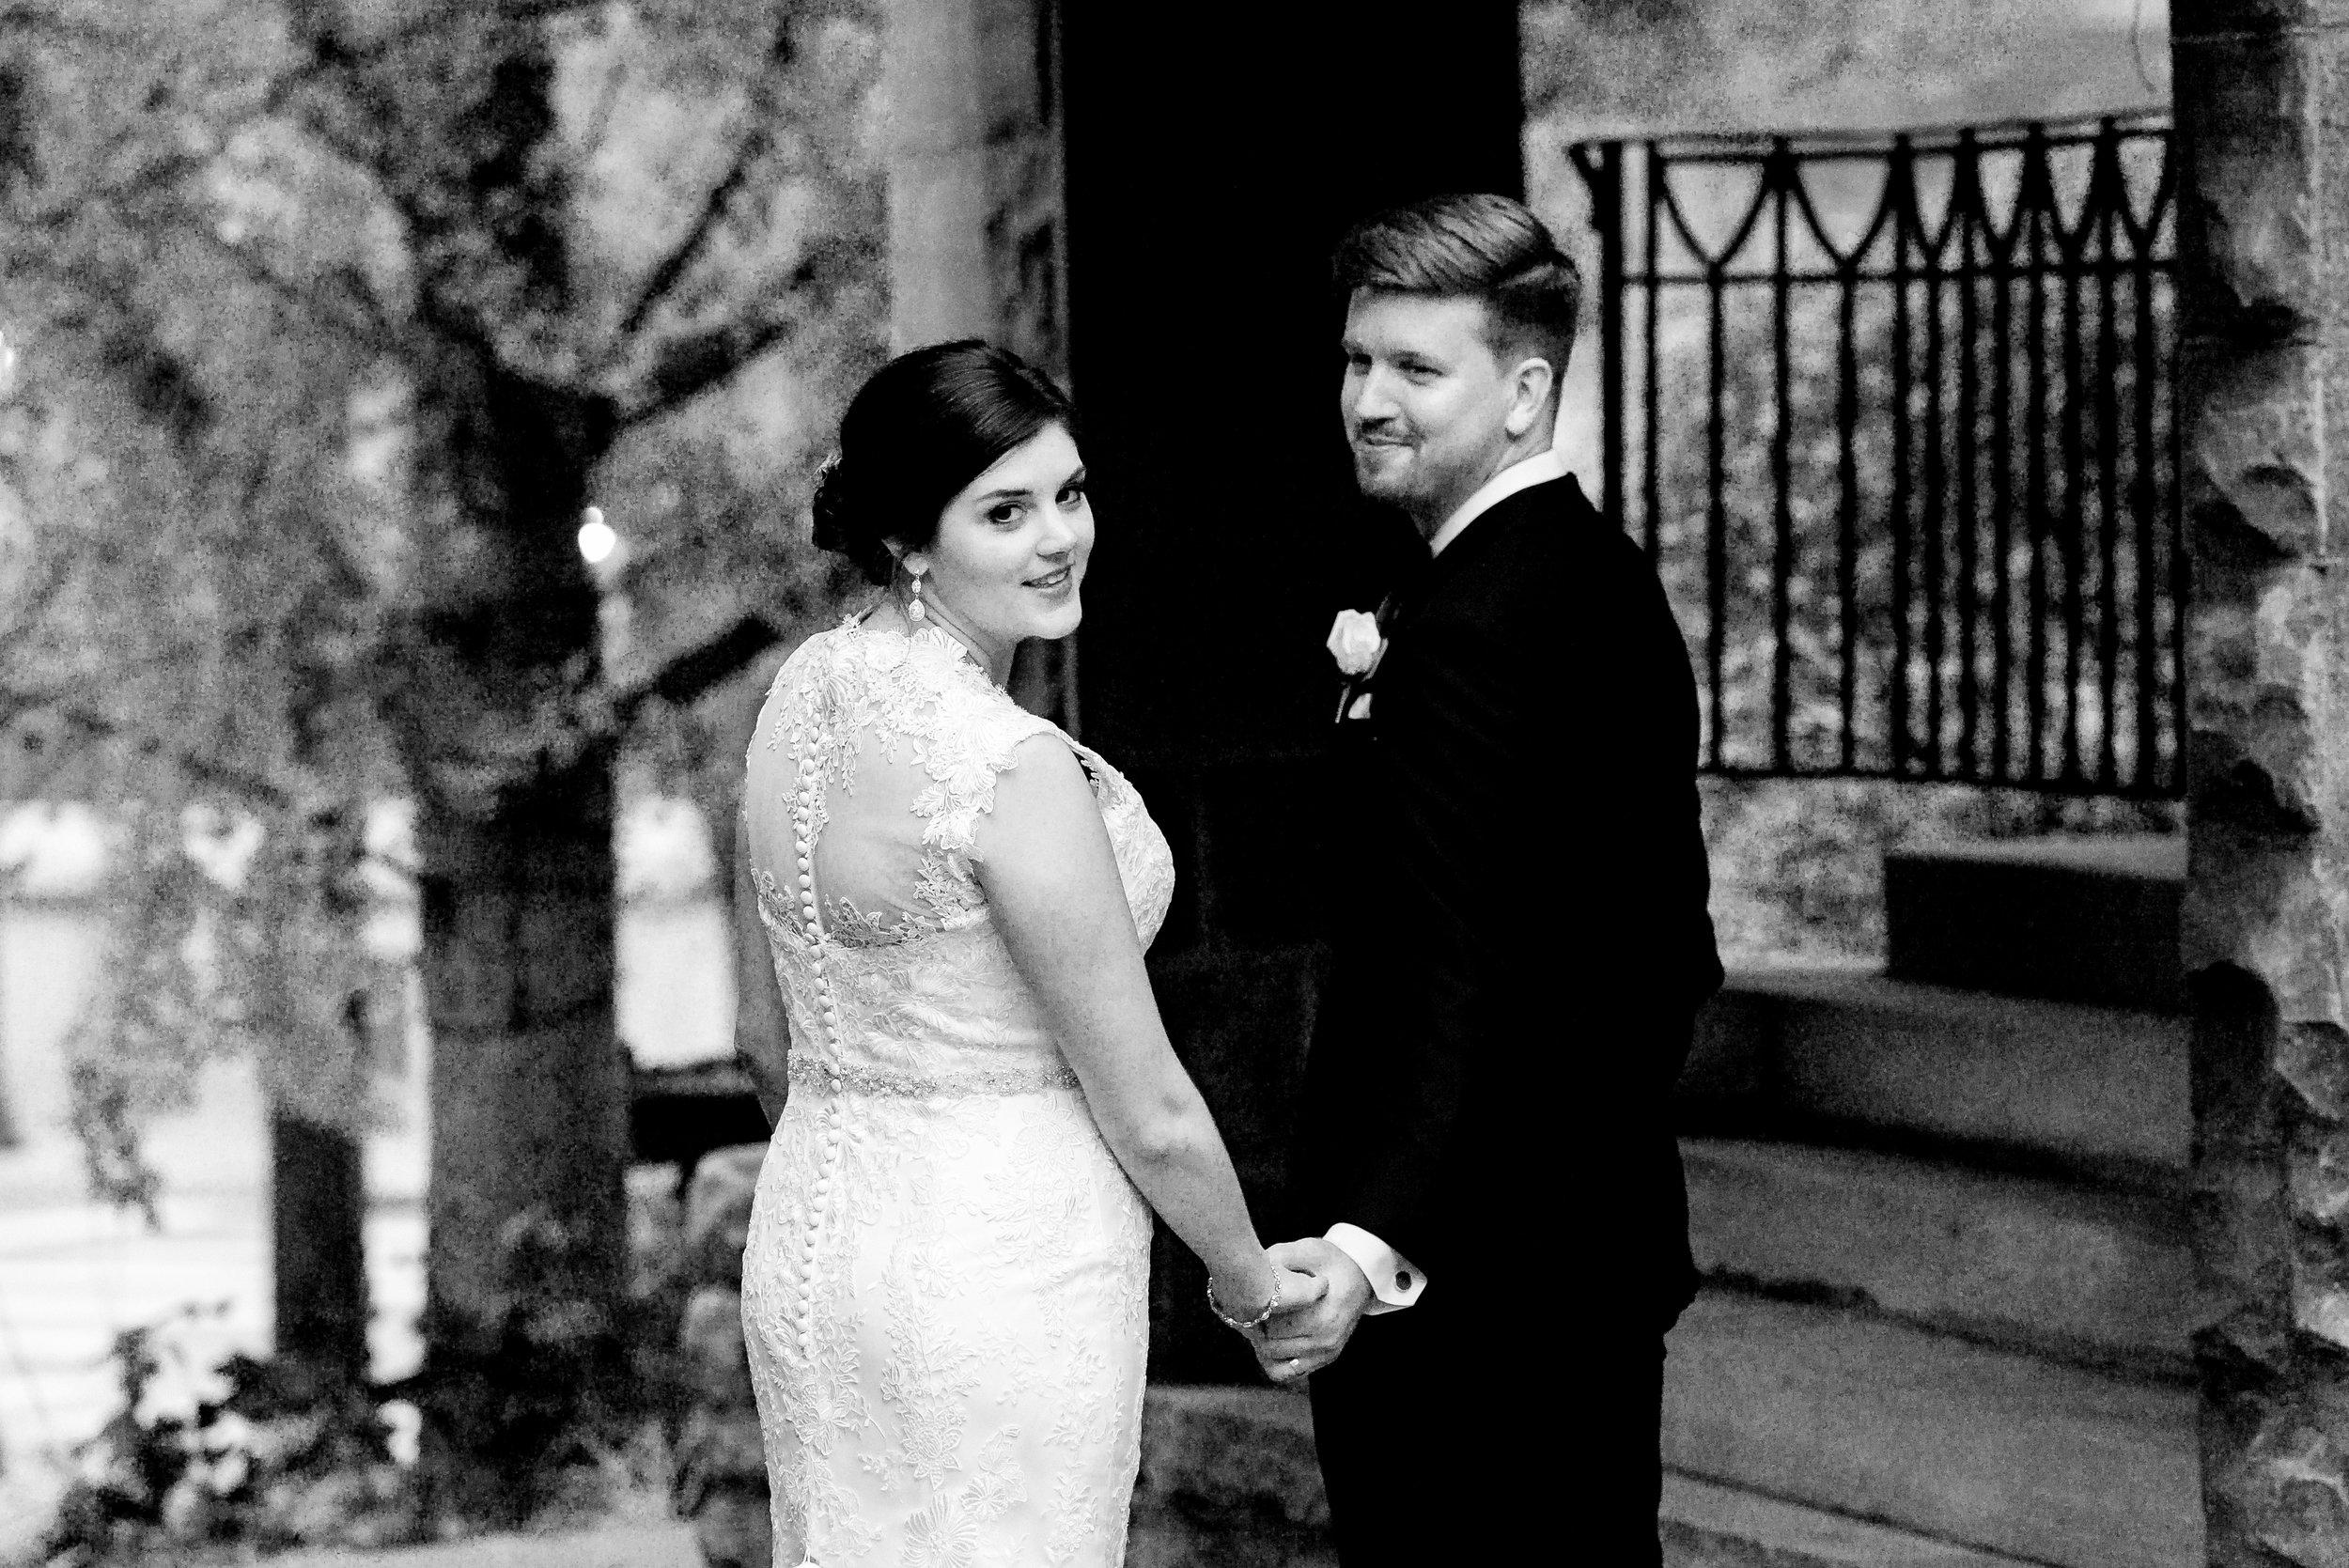 Lauren and Karl - Van Dusen Mansion Wedding and St. Olaf Catholic Church Minneapolis Wedding BW-727.jpg